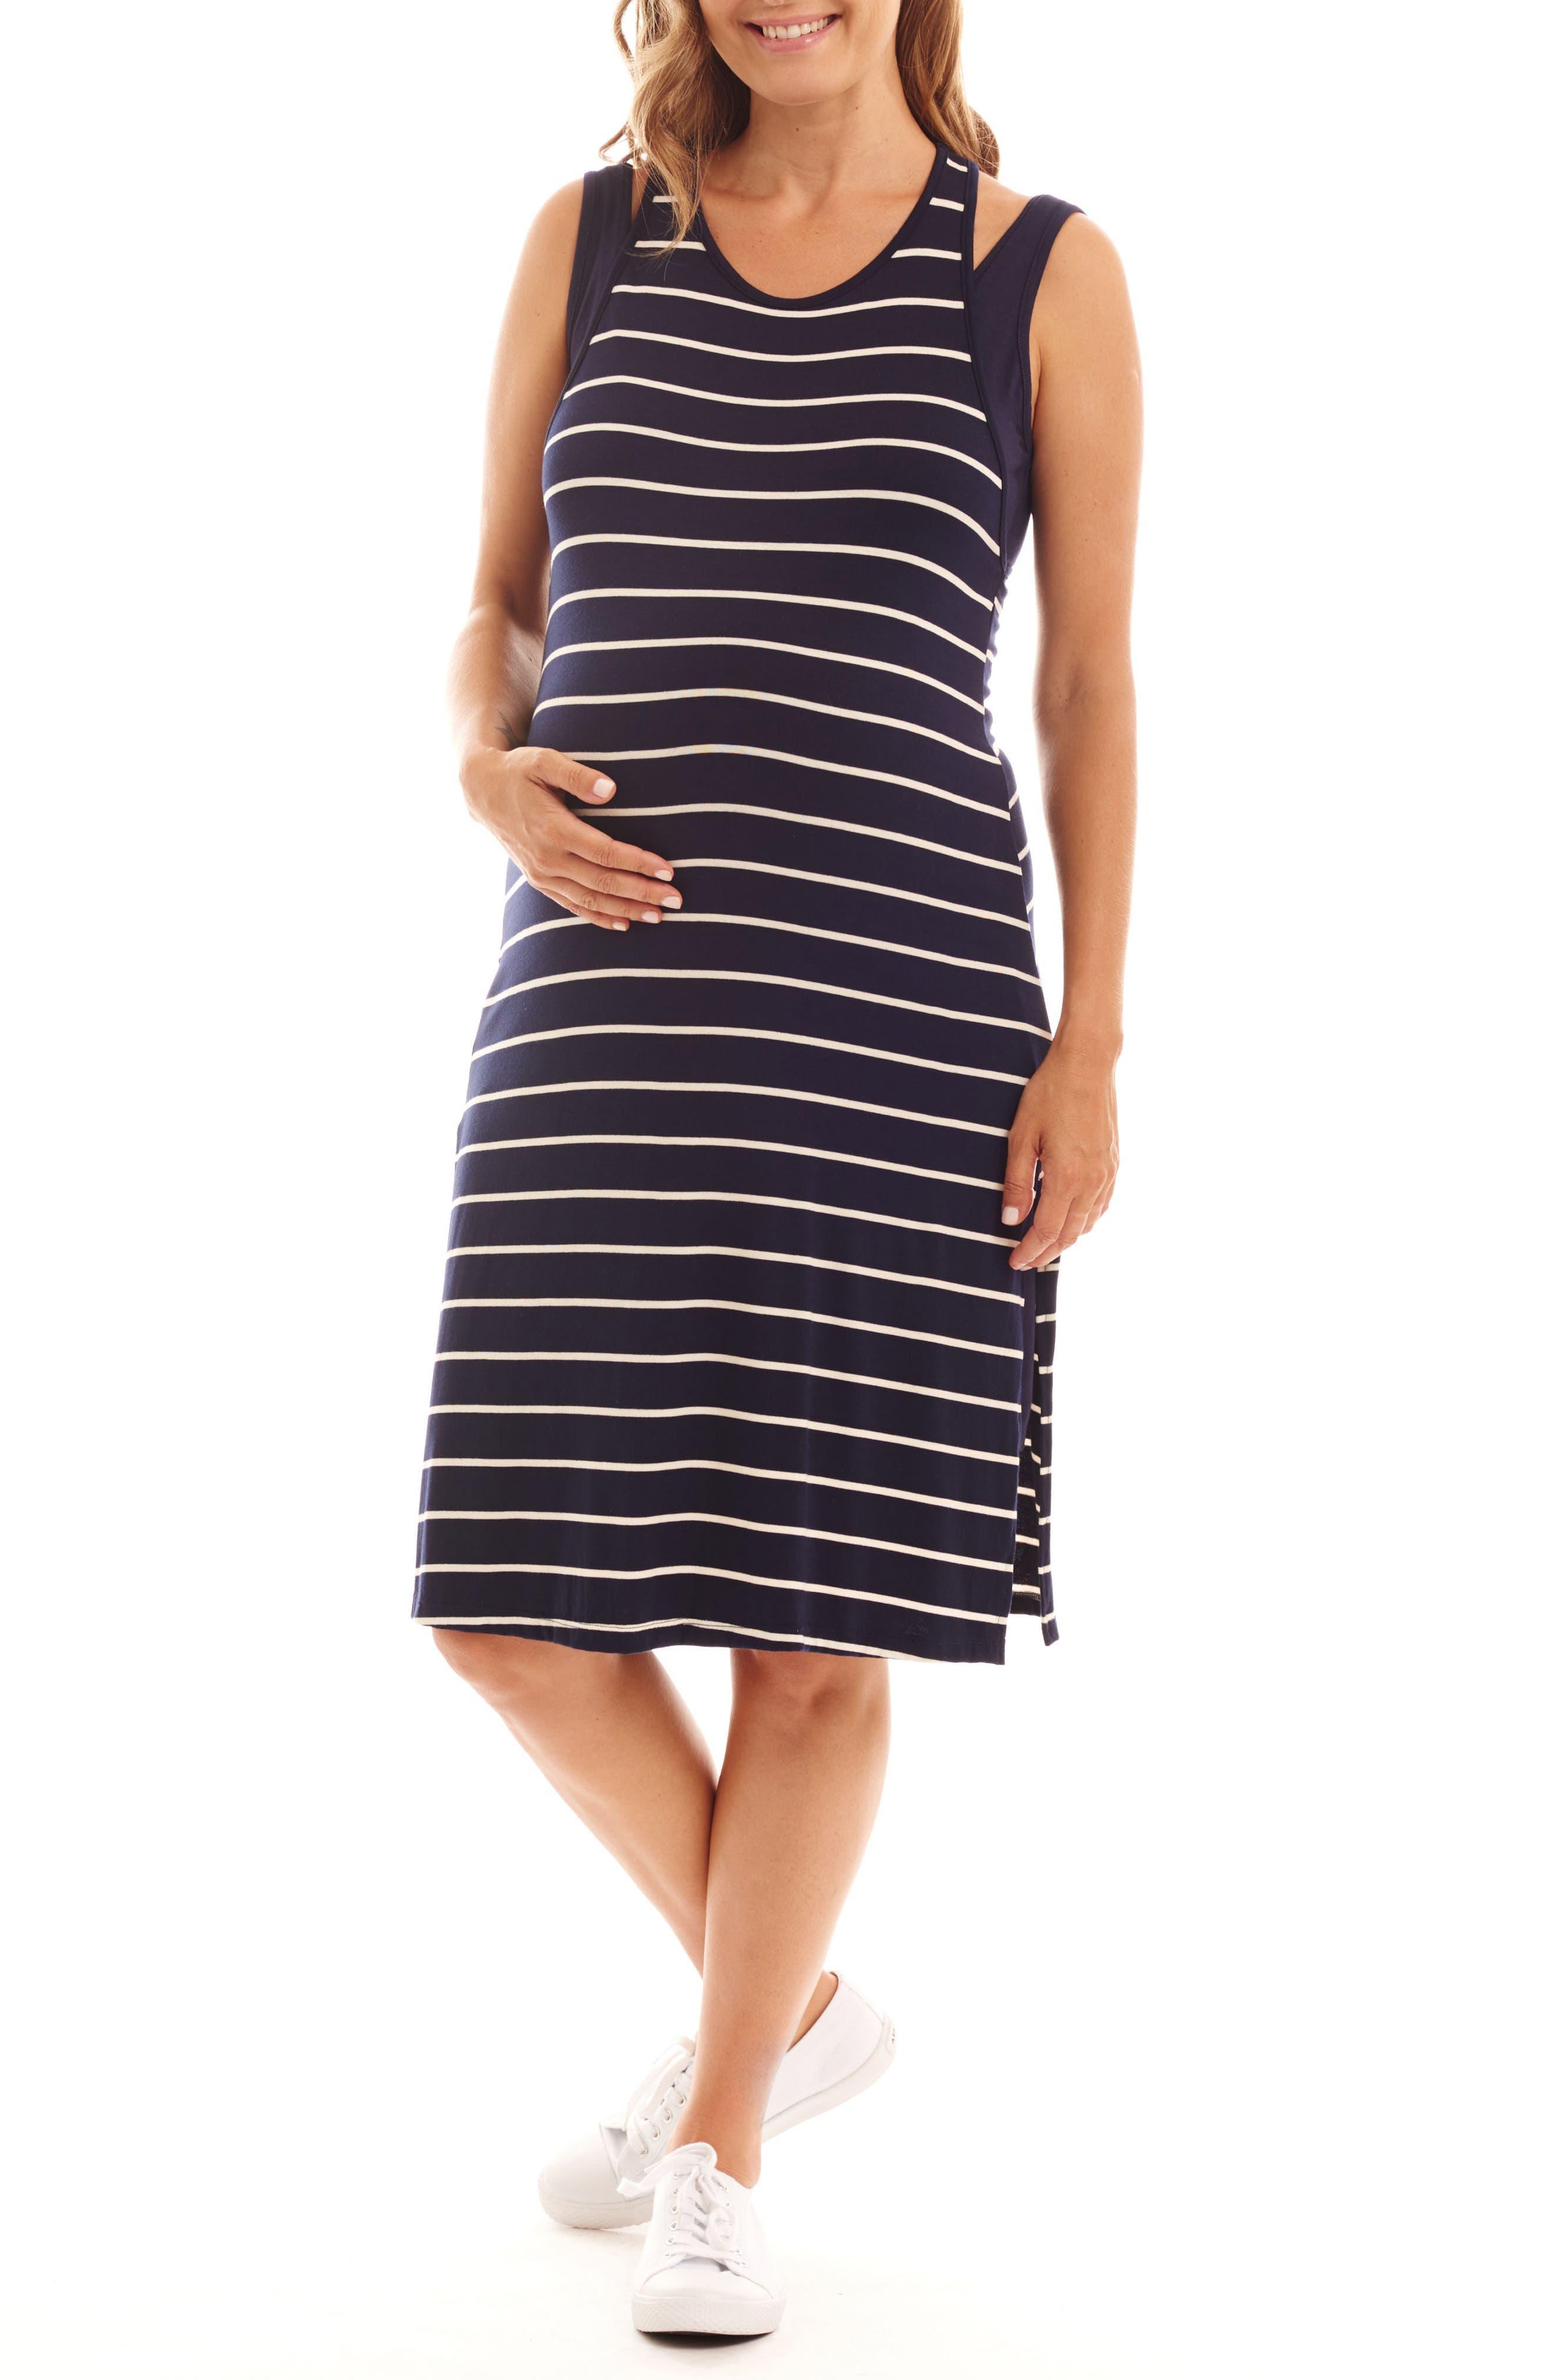 Everly Grey Alex Stripe Two-Piece Maternity/nursing Dress, Blue